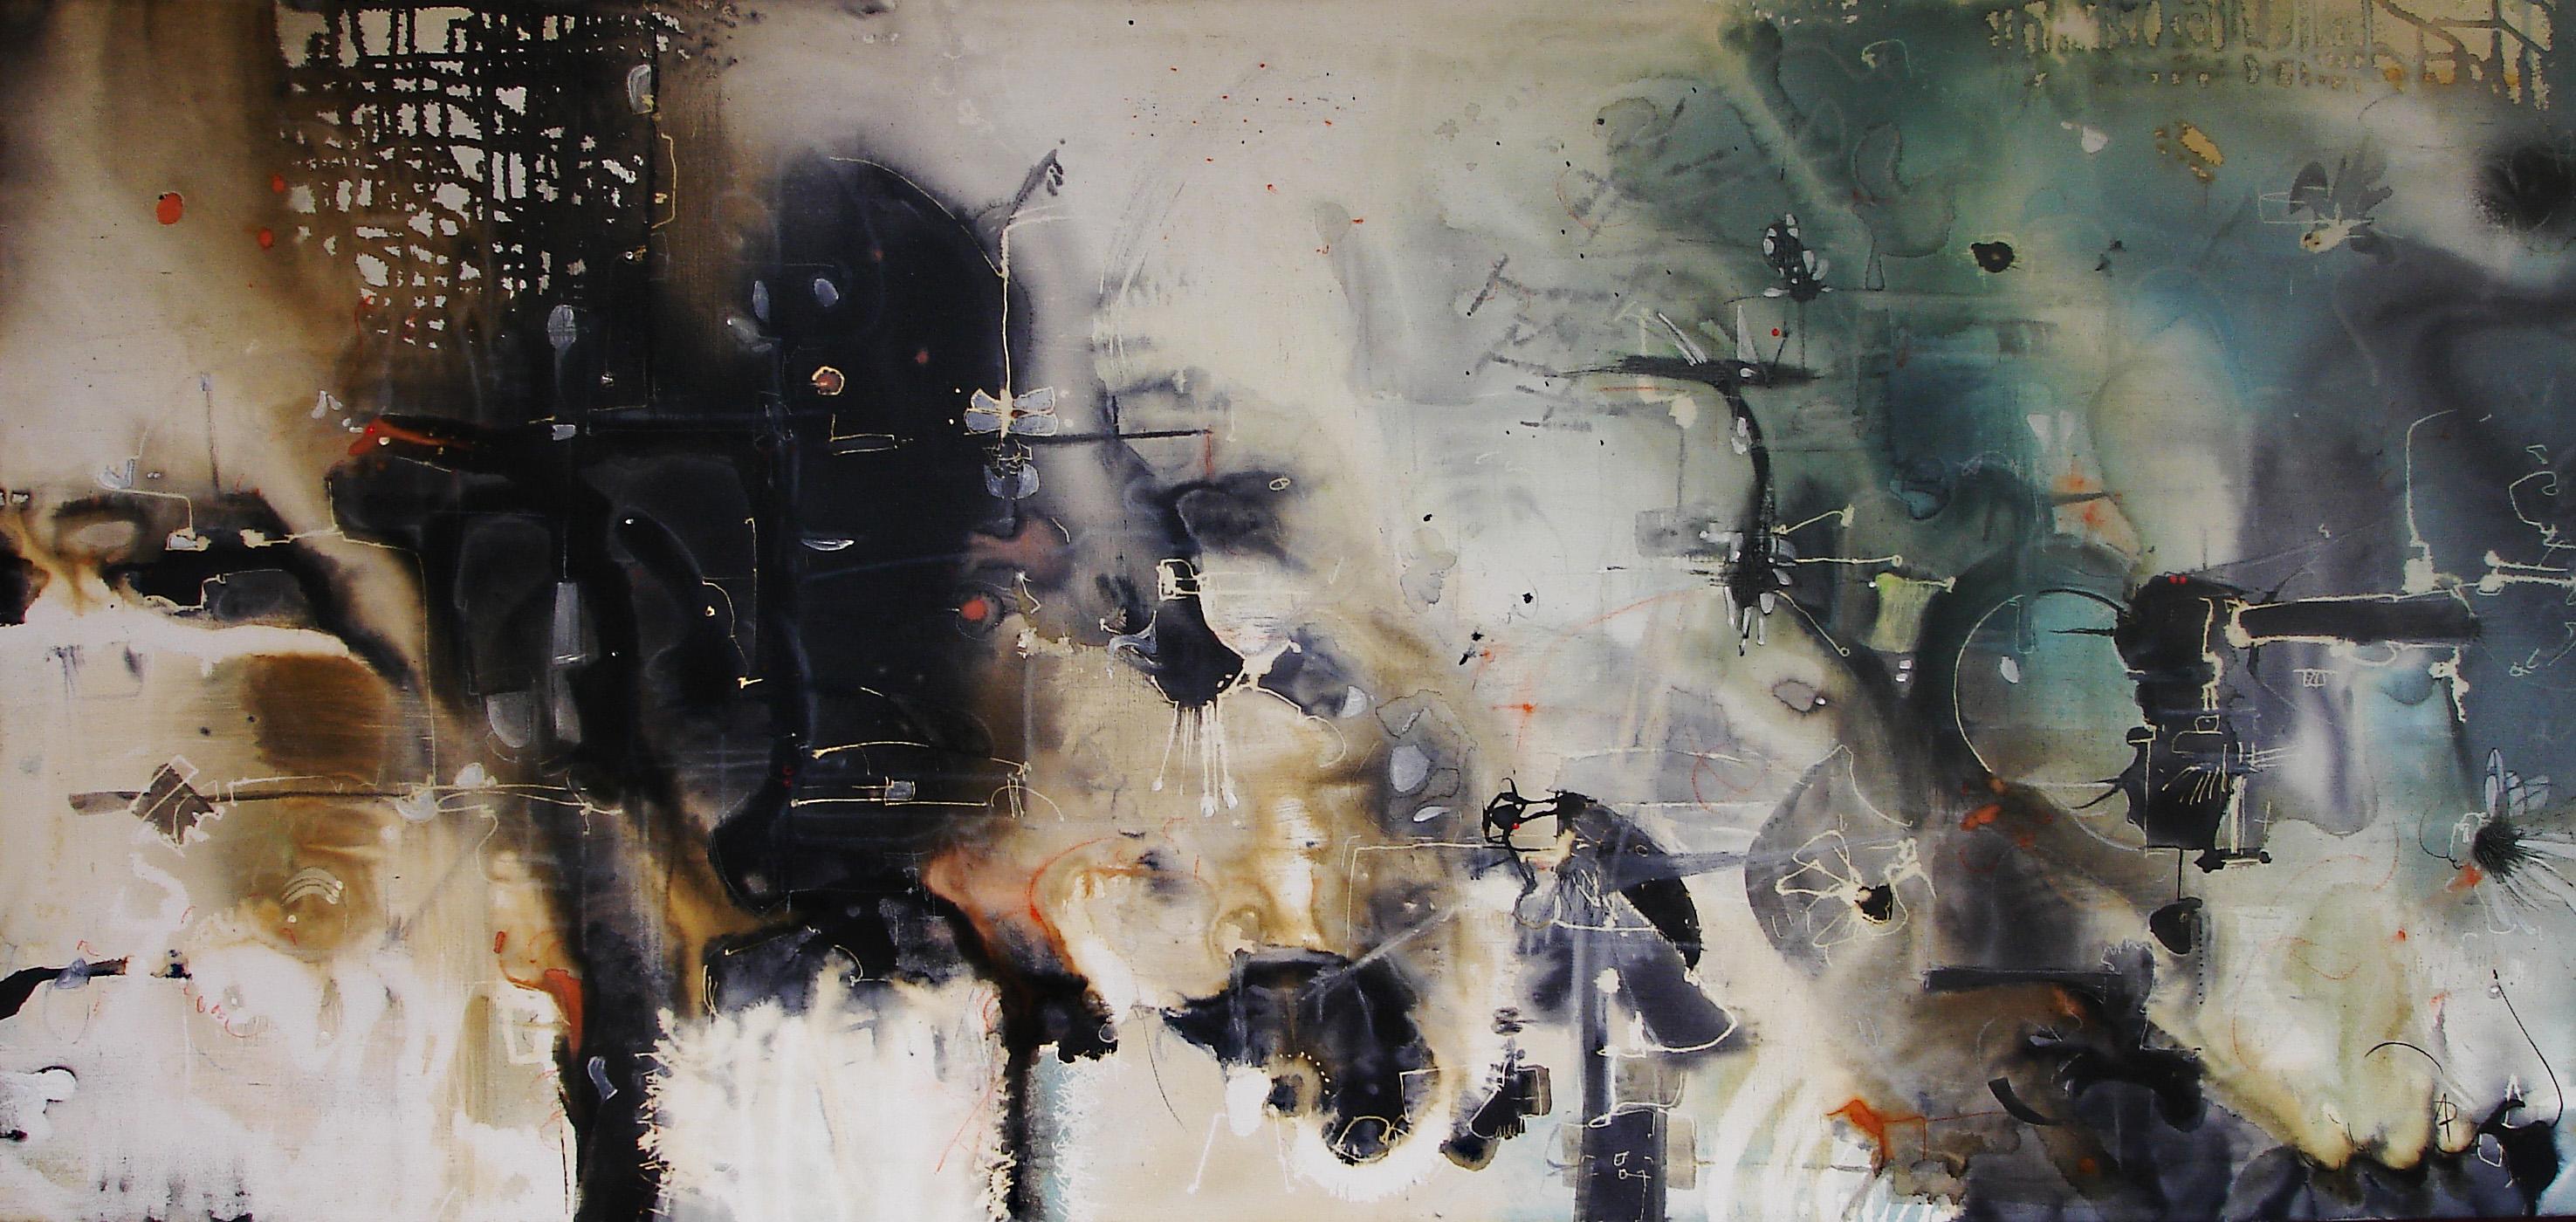 óleo,tiza y acuarela sobre tela 80 x 170 cm